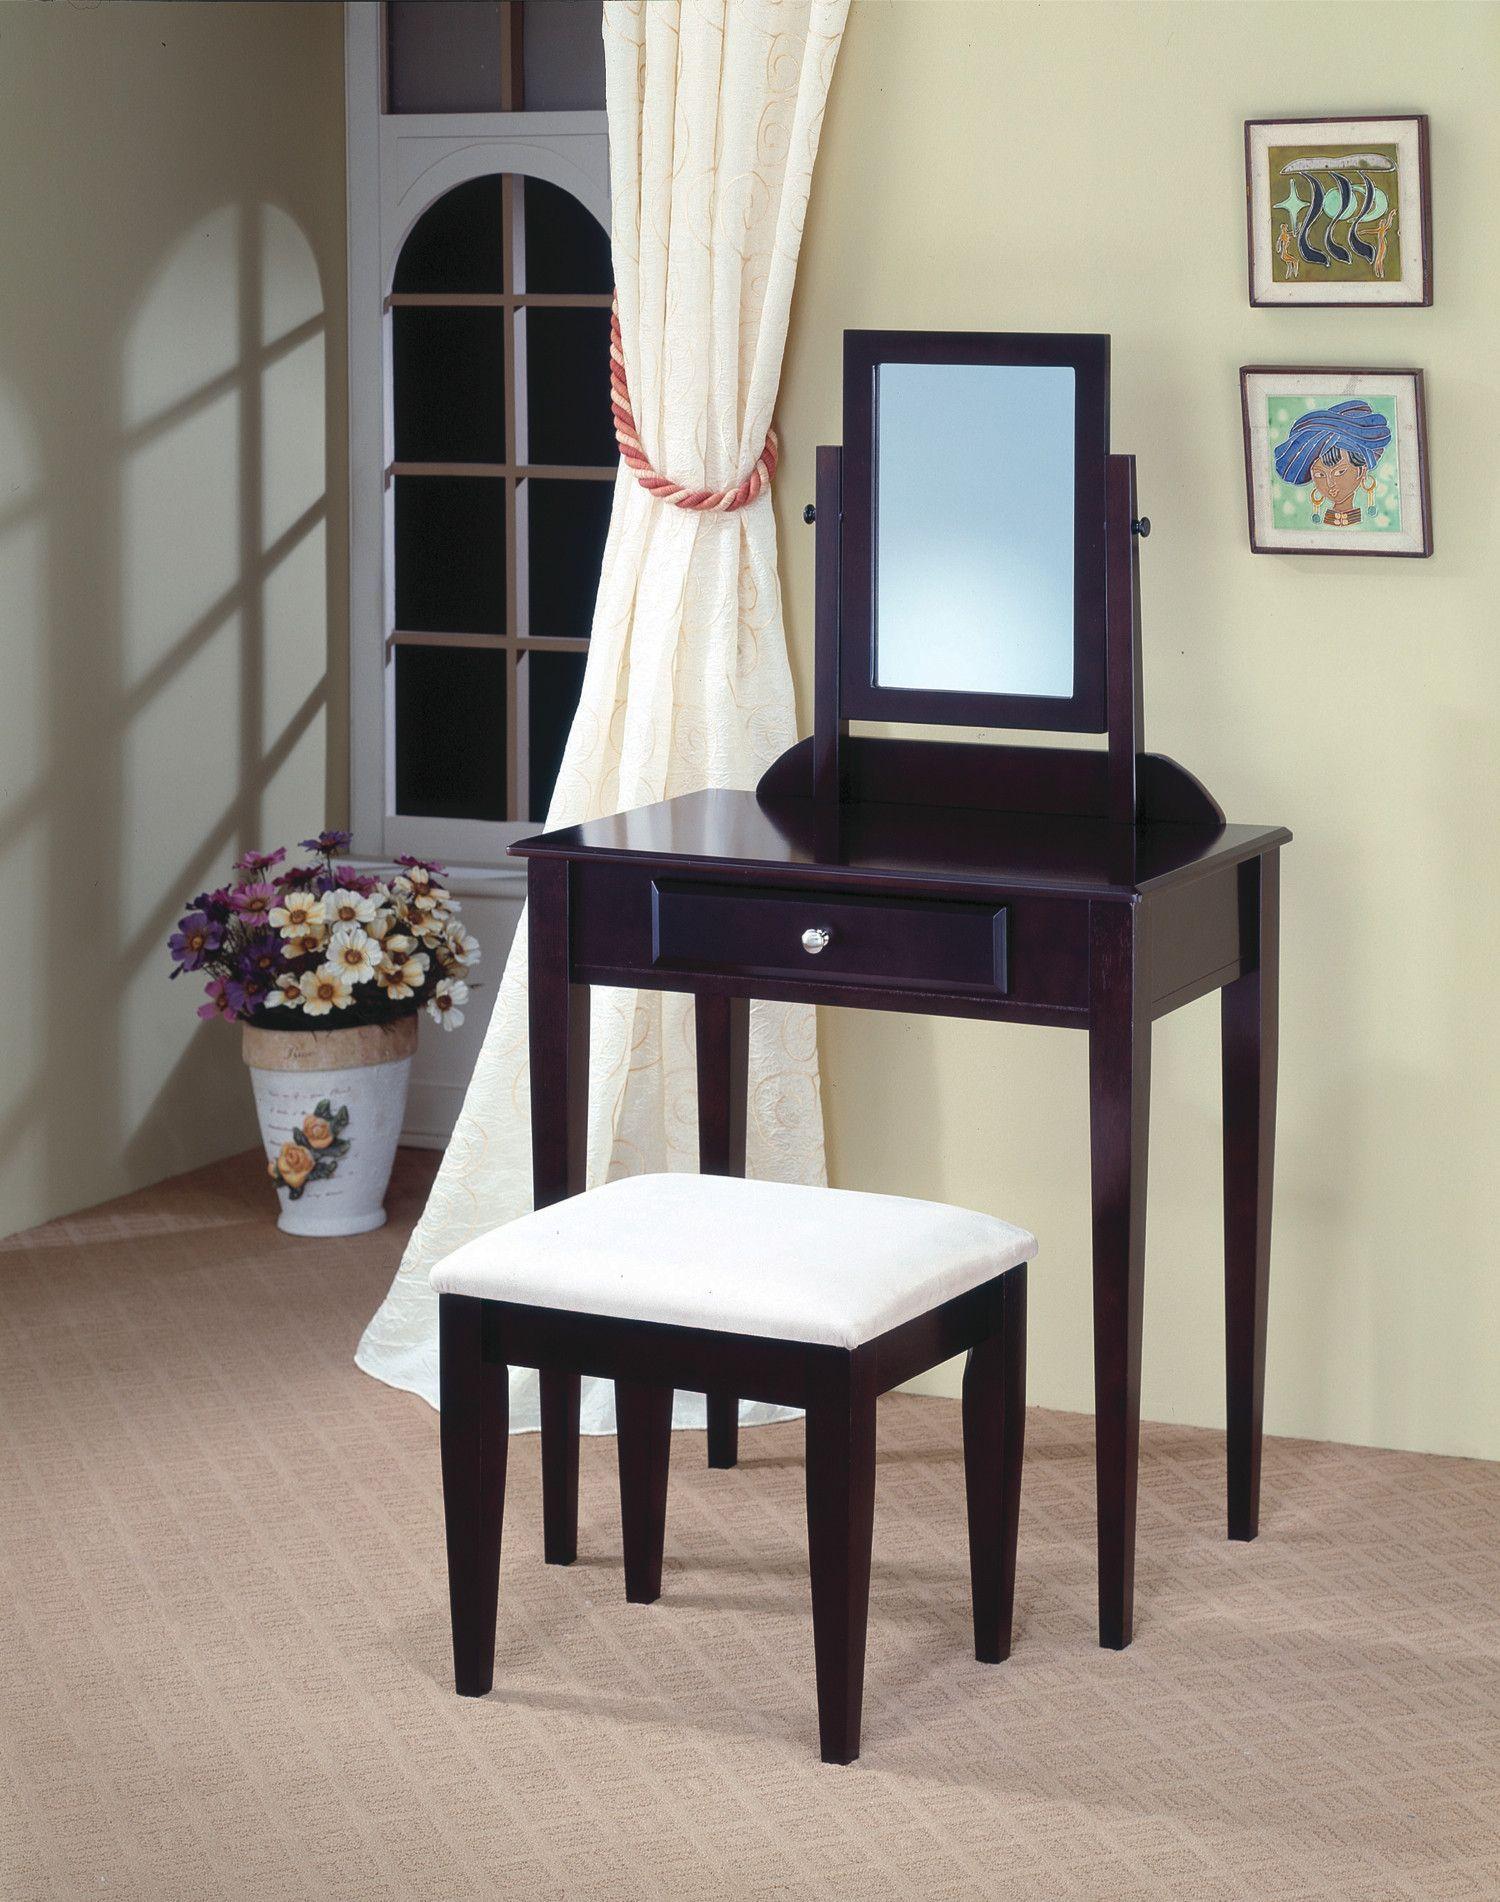 Woodinville Vanity Set with Mirror Bedroom vanity set